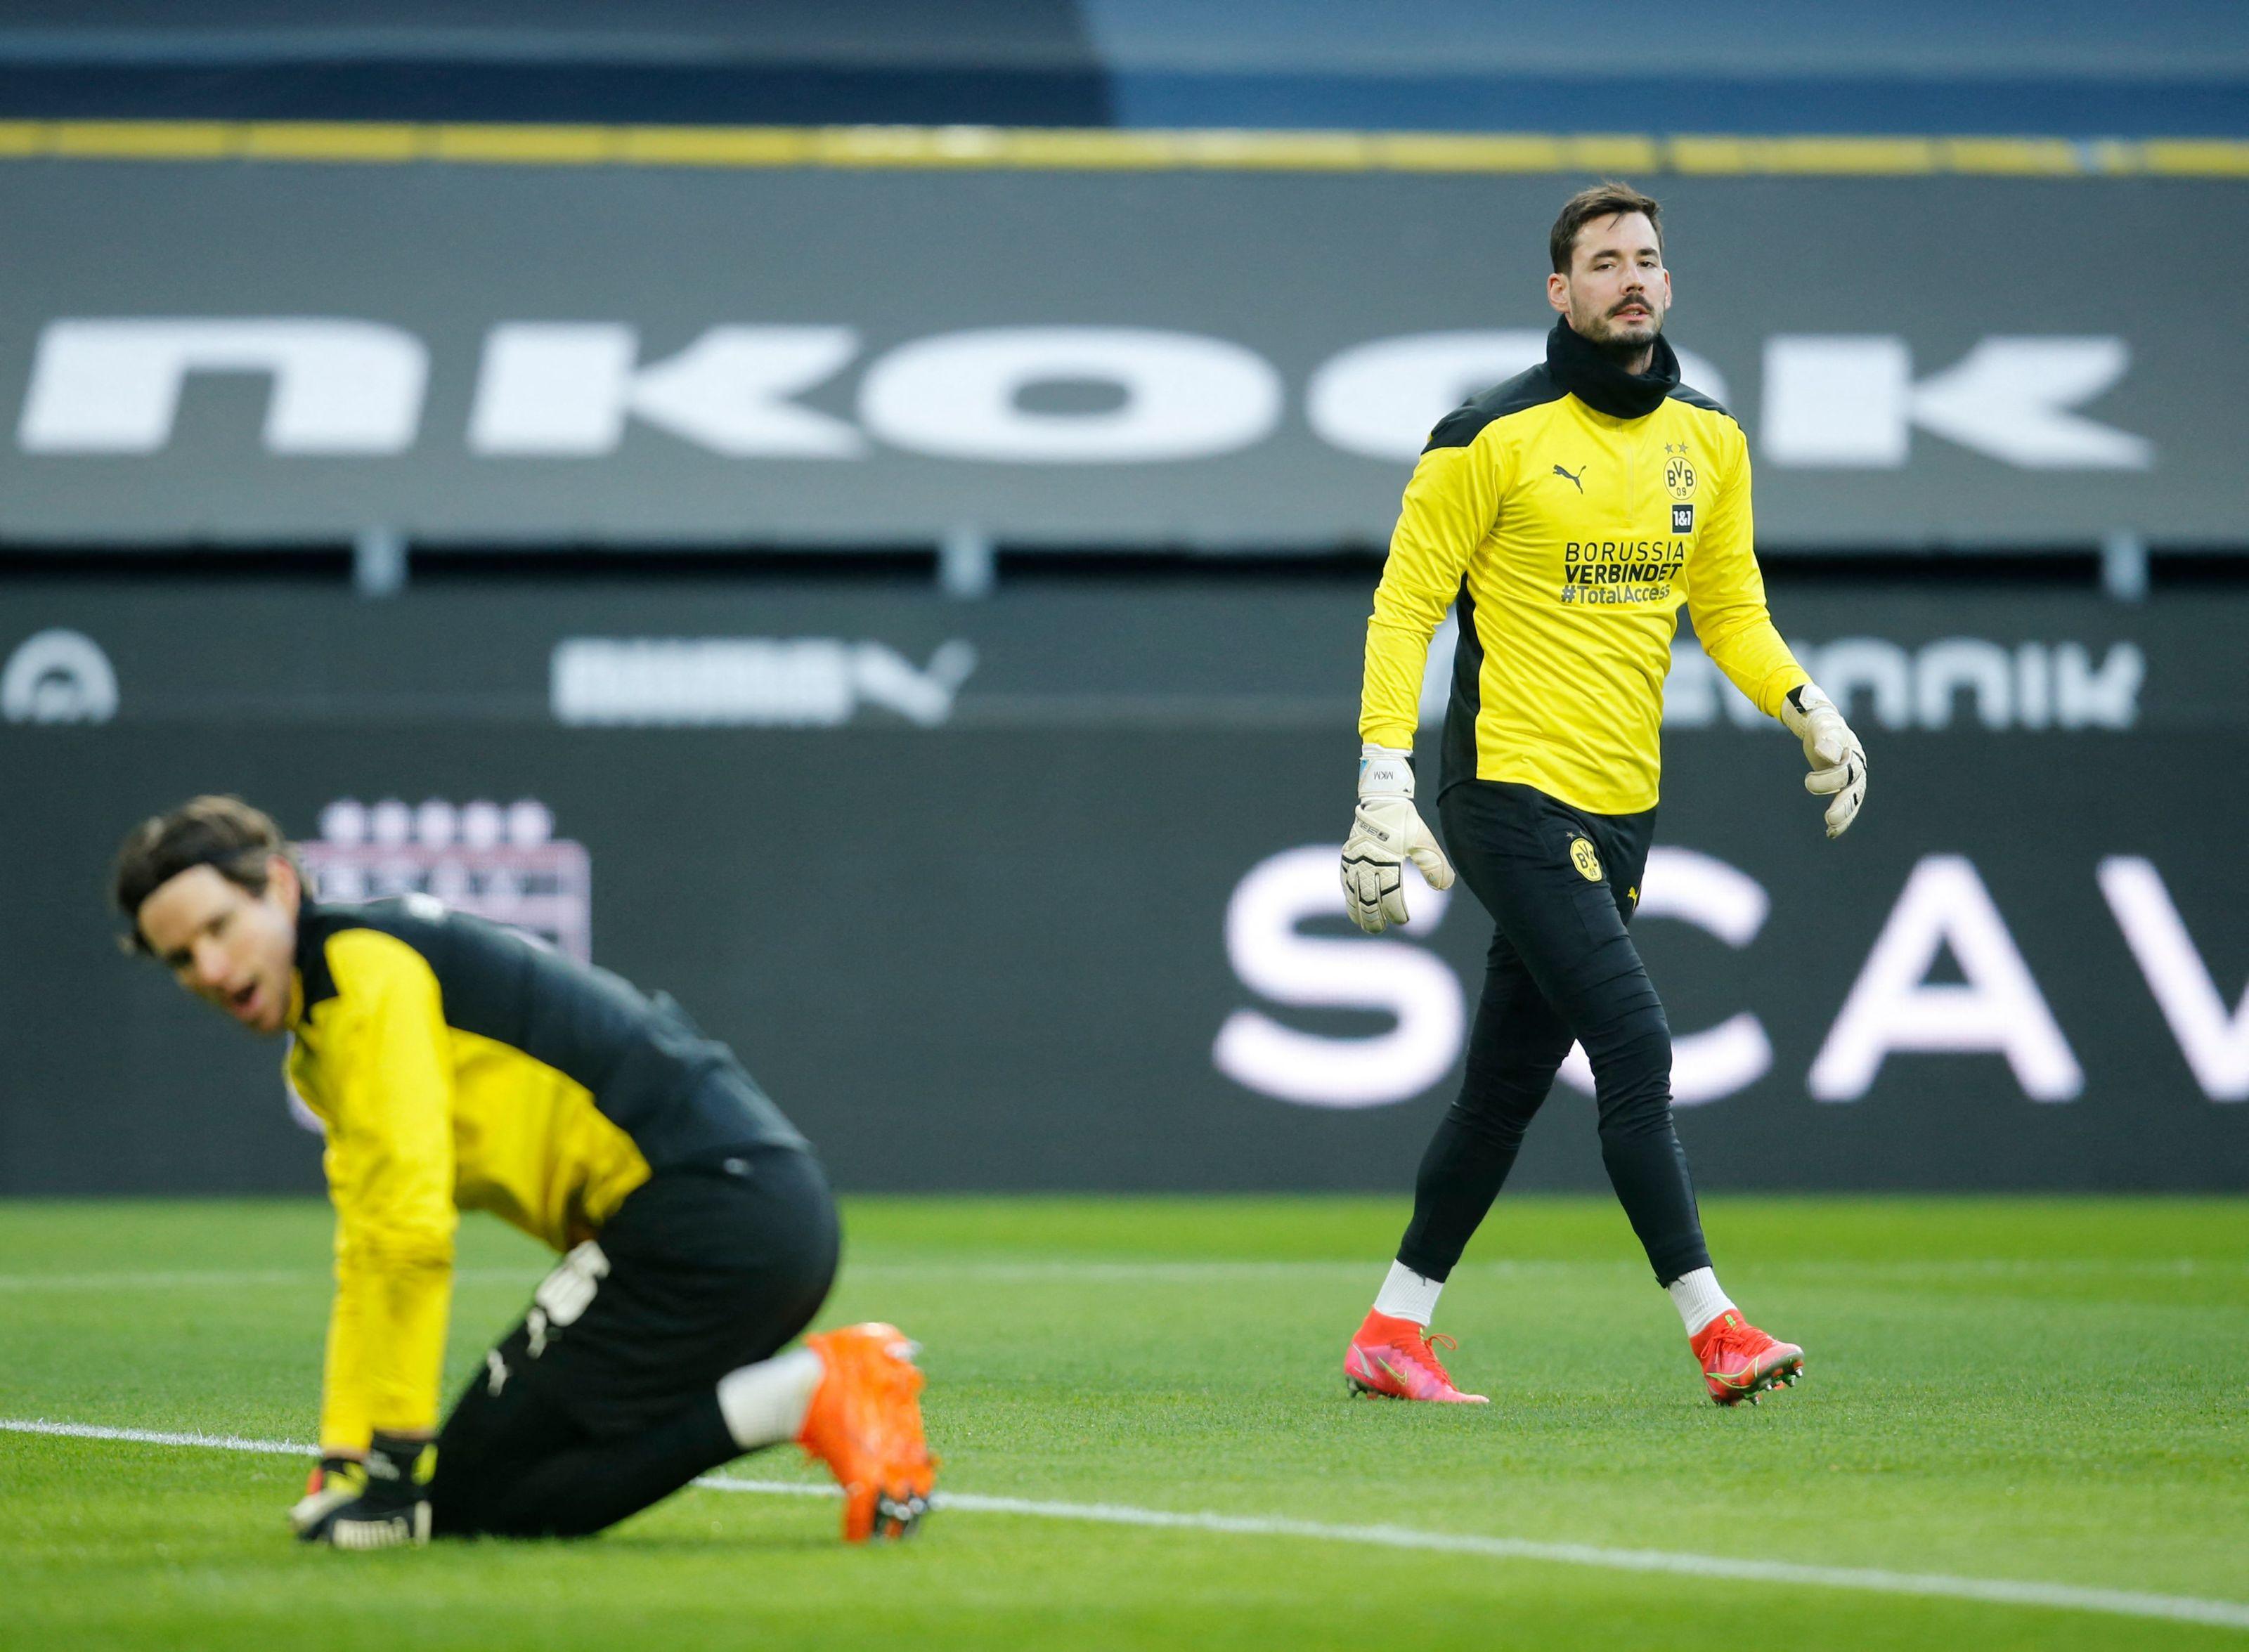 Borussia Dortmund may stick with Bürki and Hitz next season